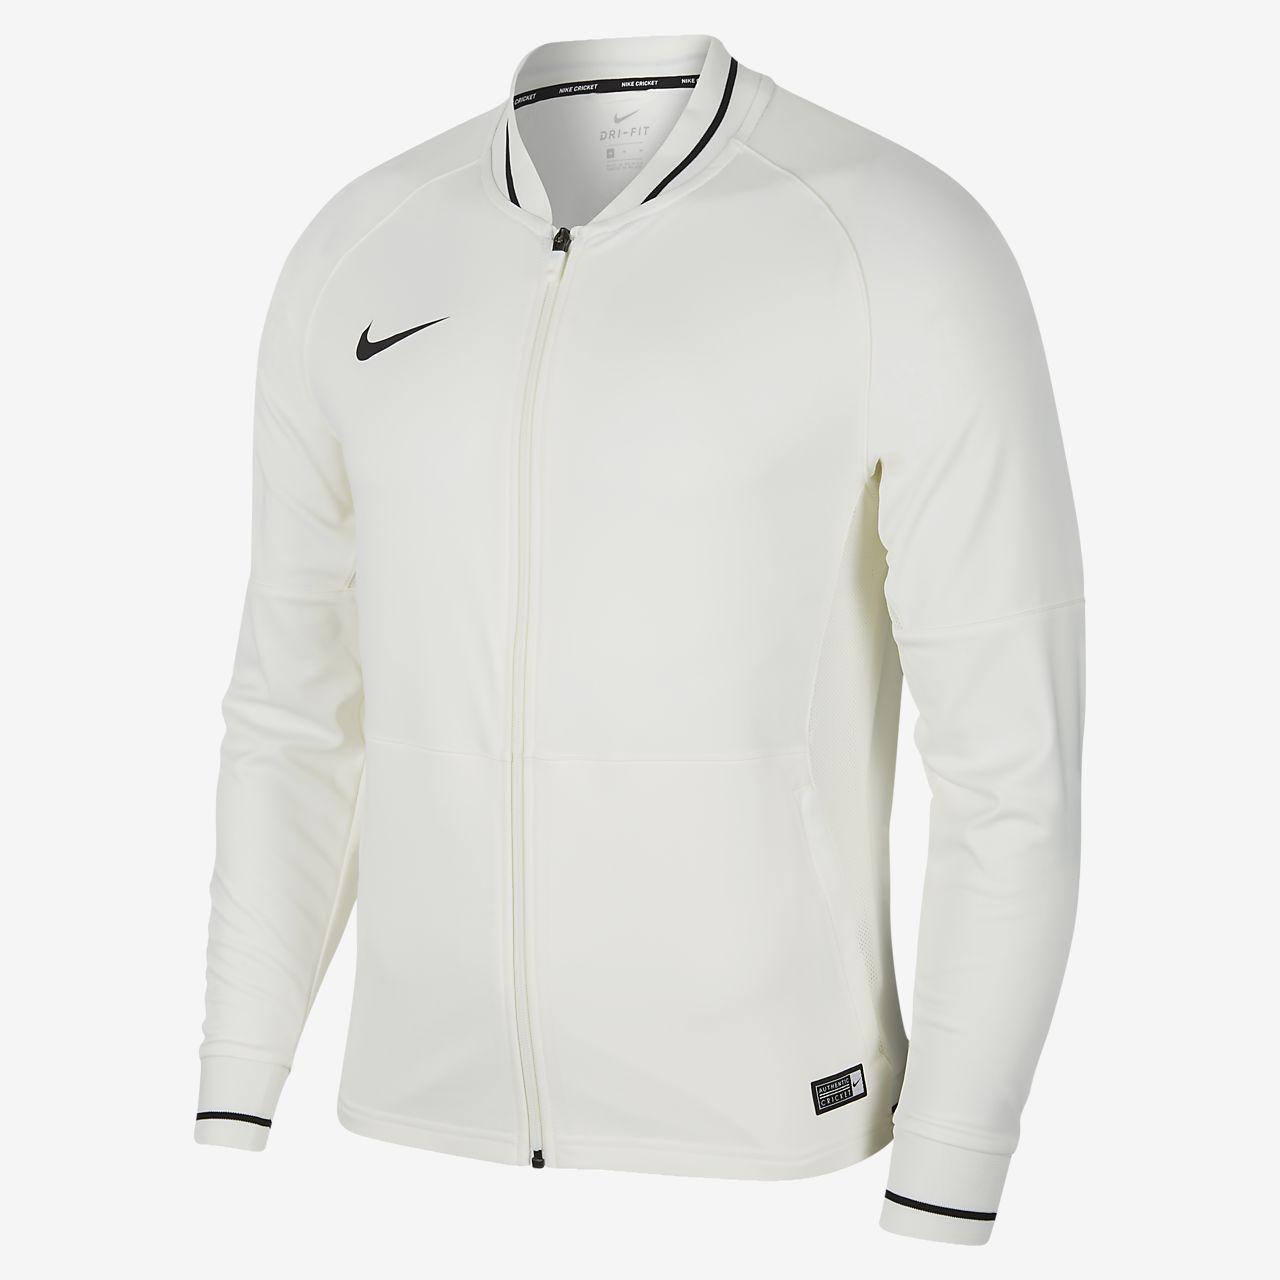 Nike Dri-FIT Men's Full-Zip Cricket Jacket